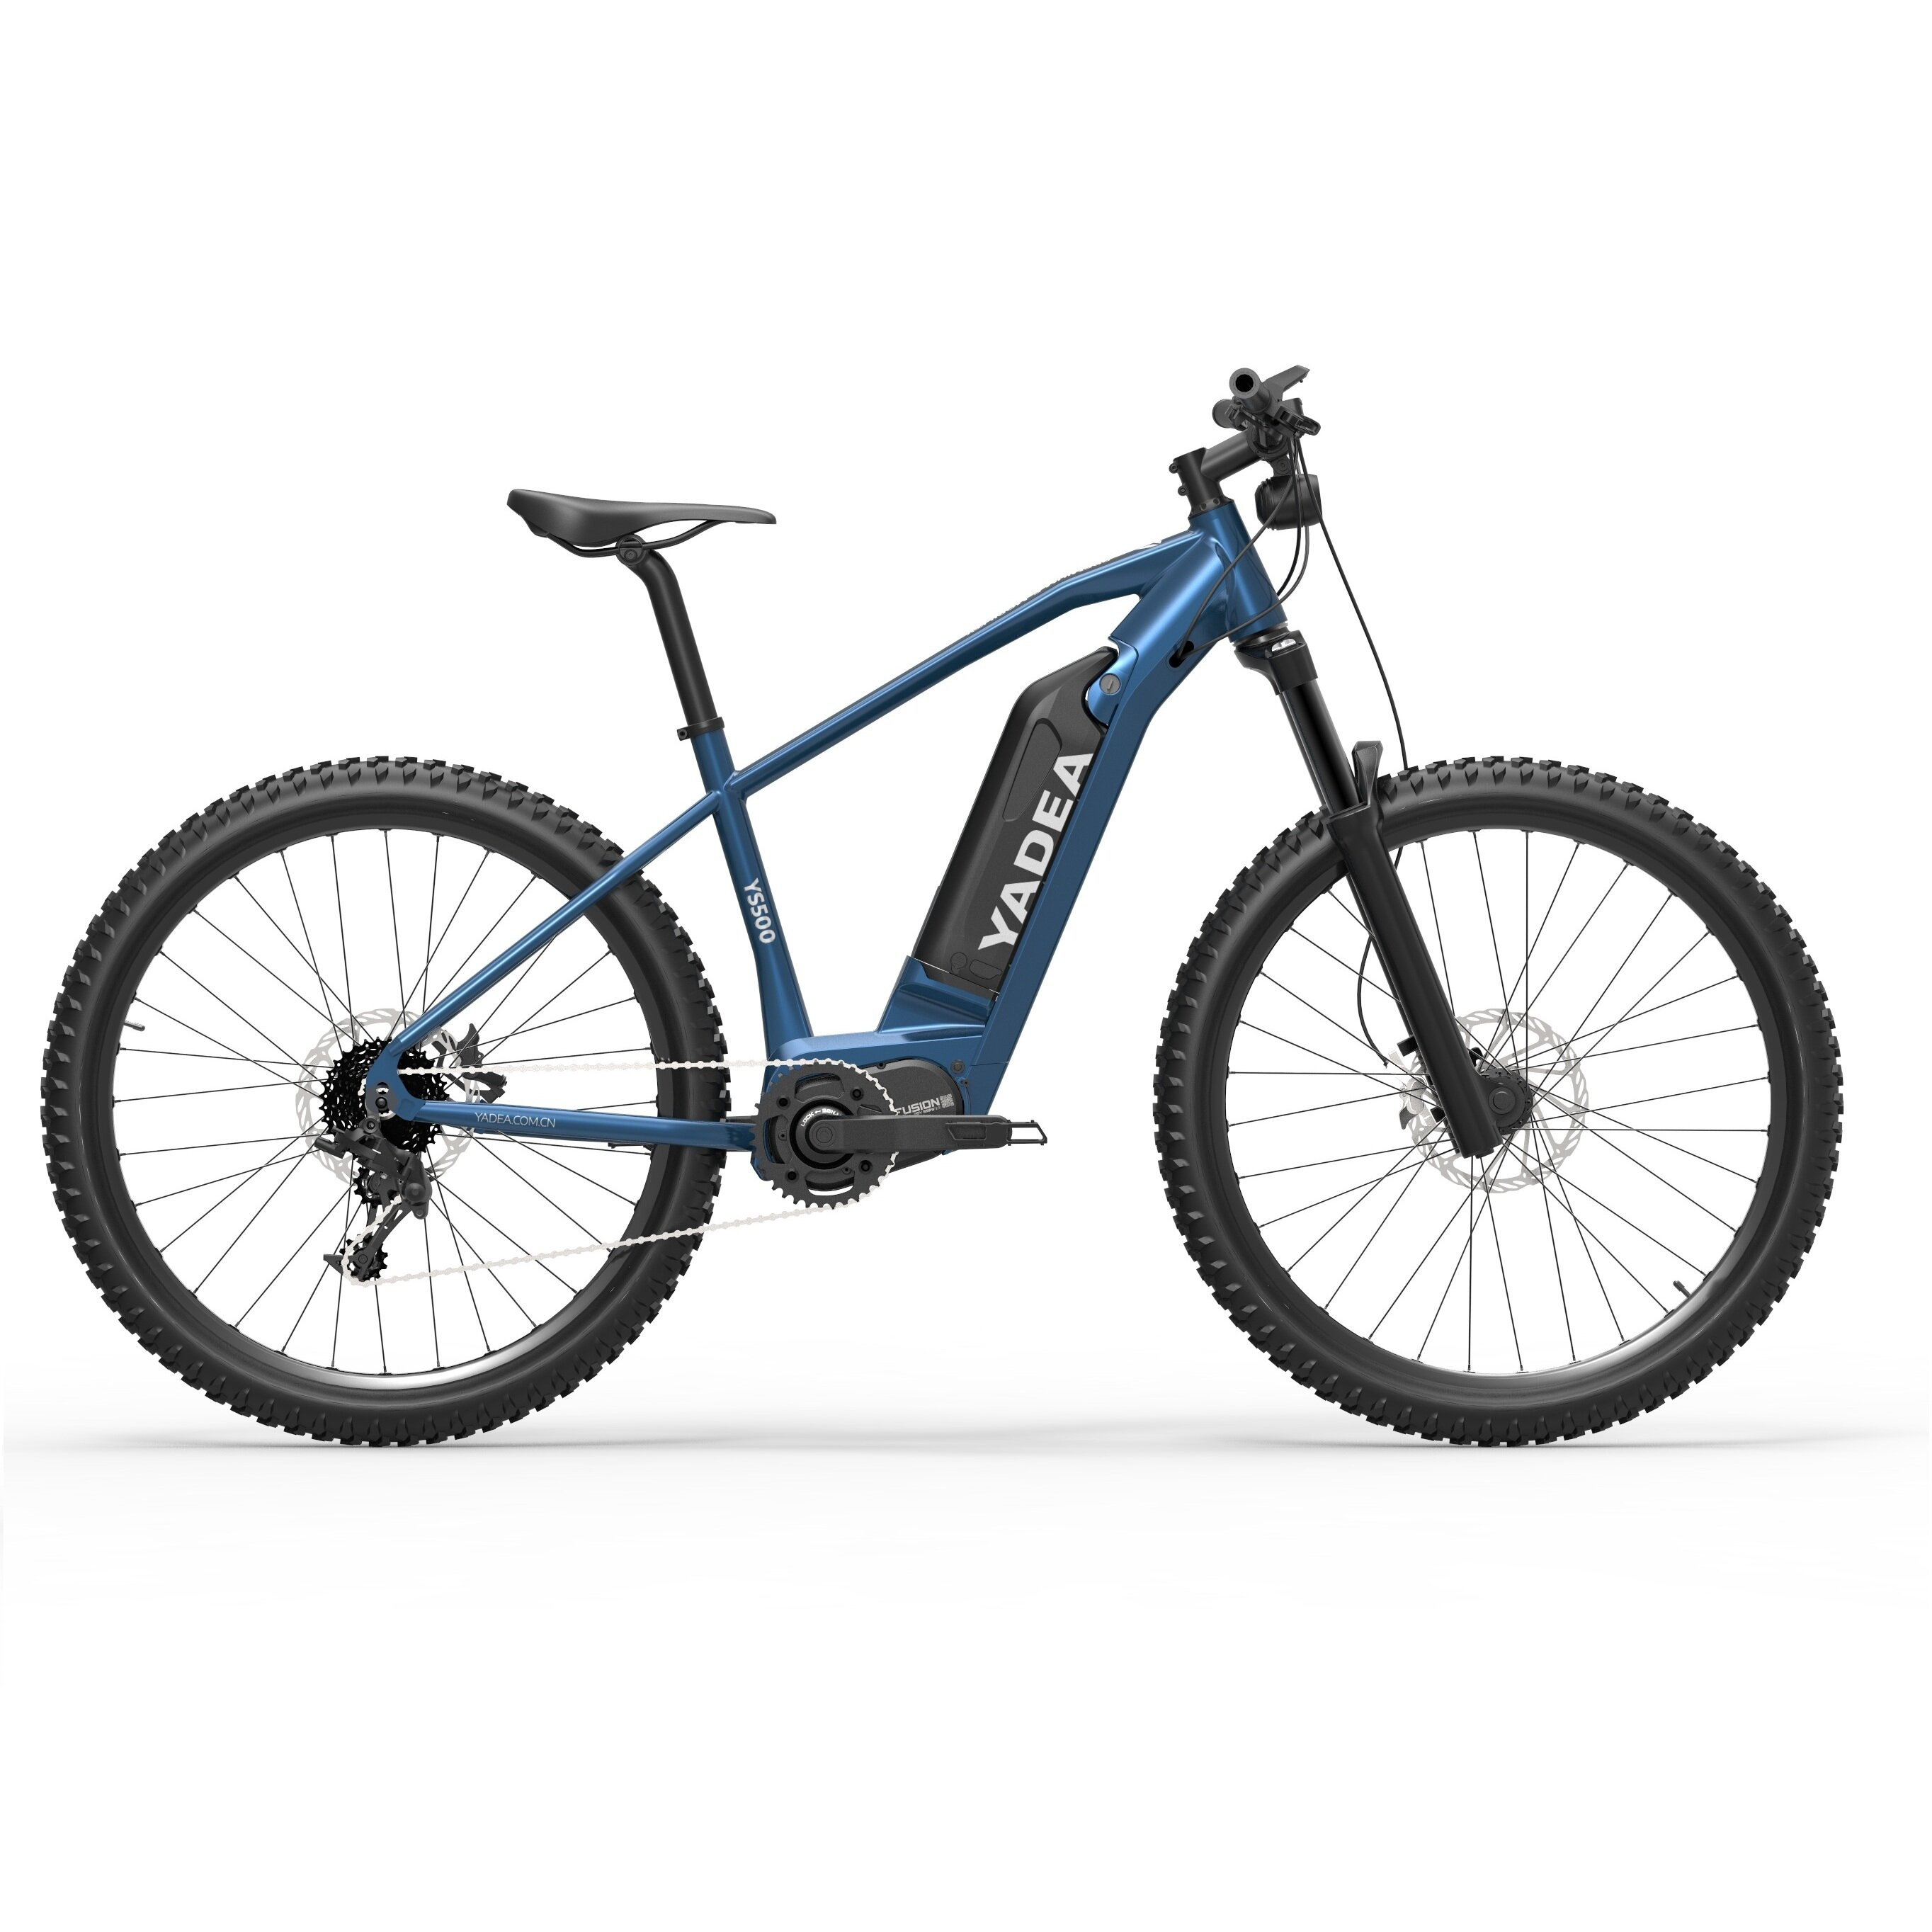 [EU DIRECT] YADEA YS500 27.5Inch 350W 13Ah 3-Speed Assist Mode Electric Bicycle 25Km/h Max Speed 80-100Km Mileage 150Kg Max Load Electric Bike